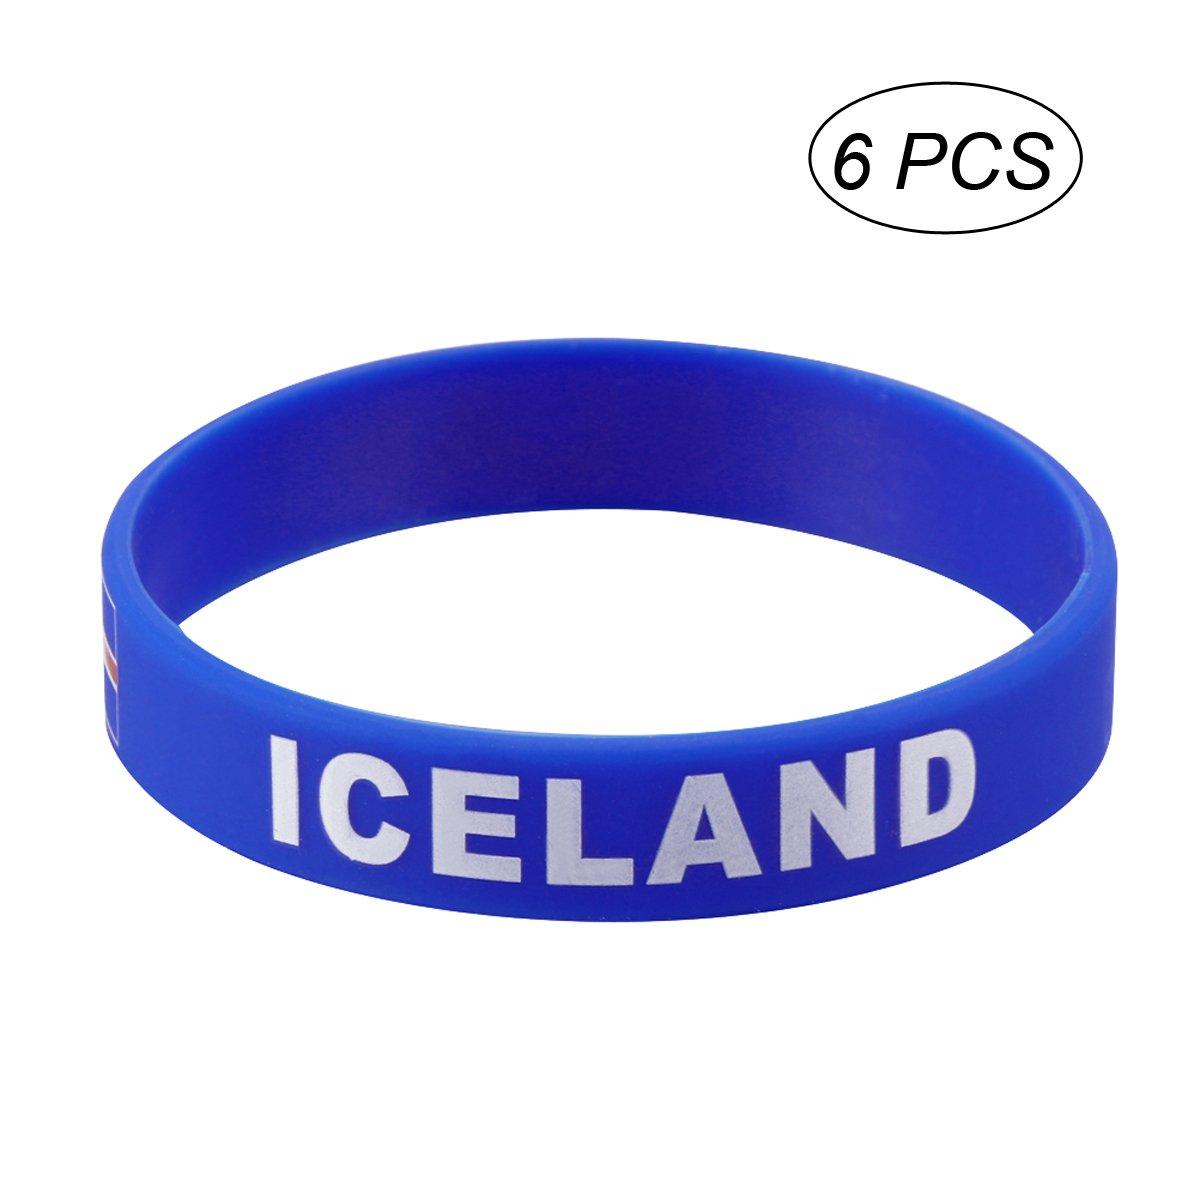 LUOEM Silikon Armb/änder WM Flagge Fahne Island Land Armband Fanartikel Fussball 2018 WM 6 St/ücke Iceland